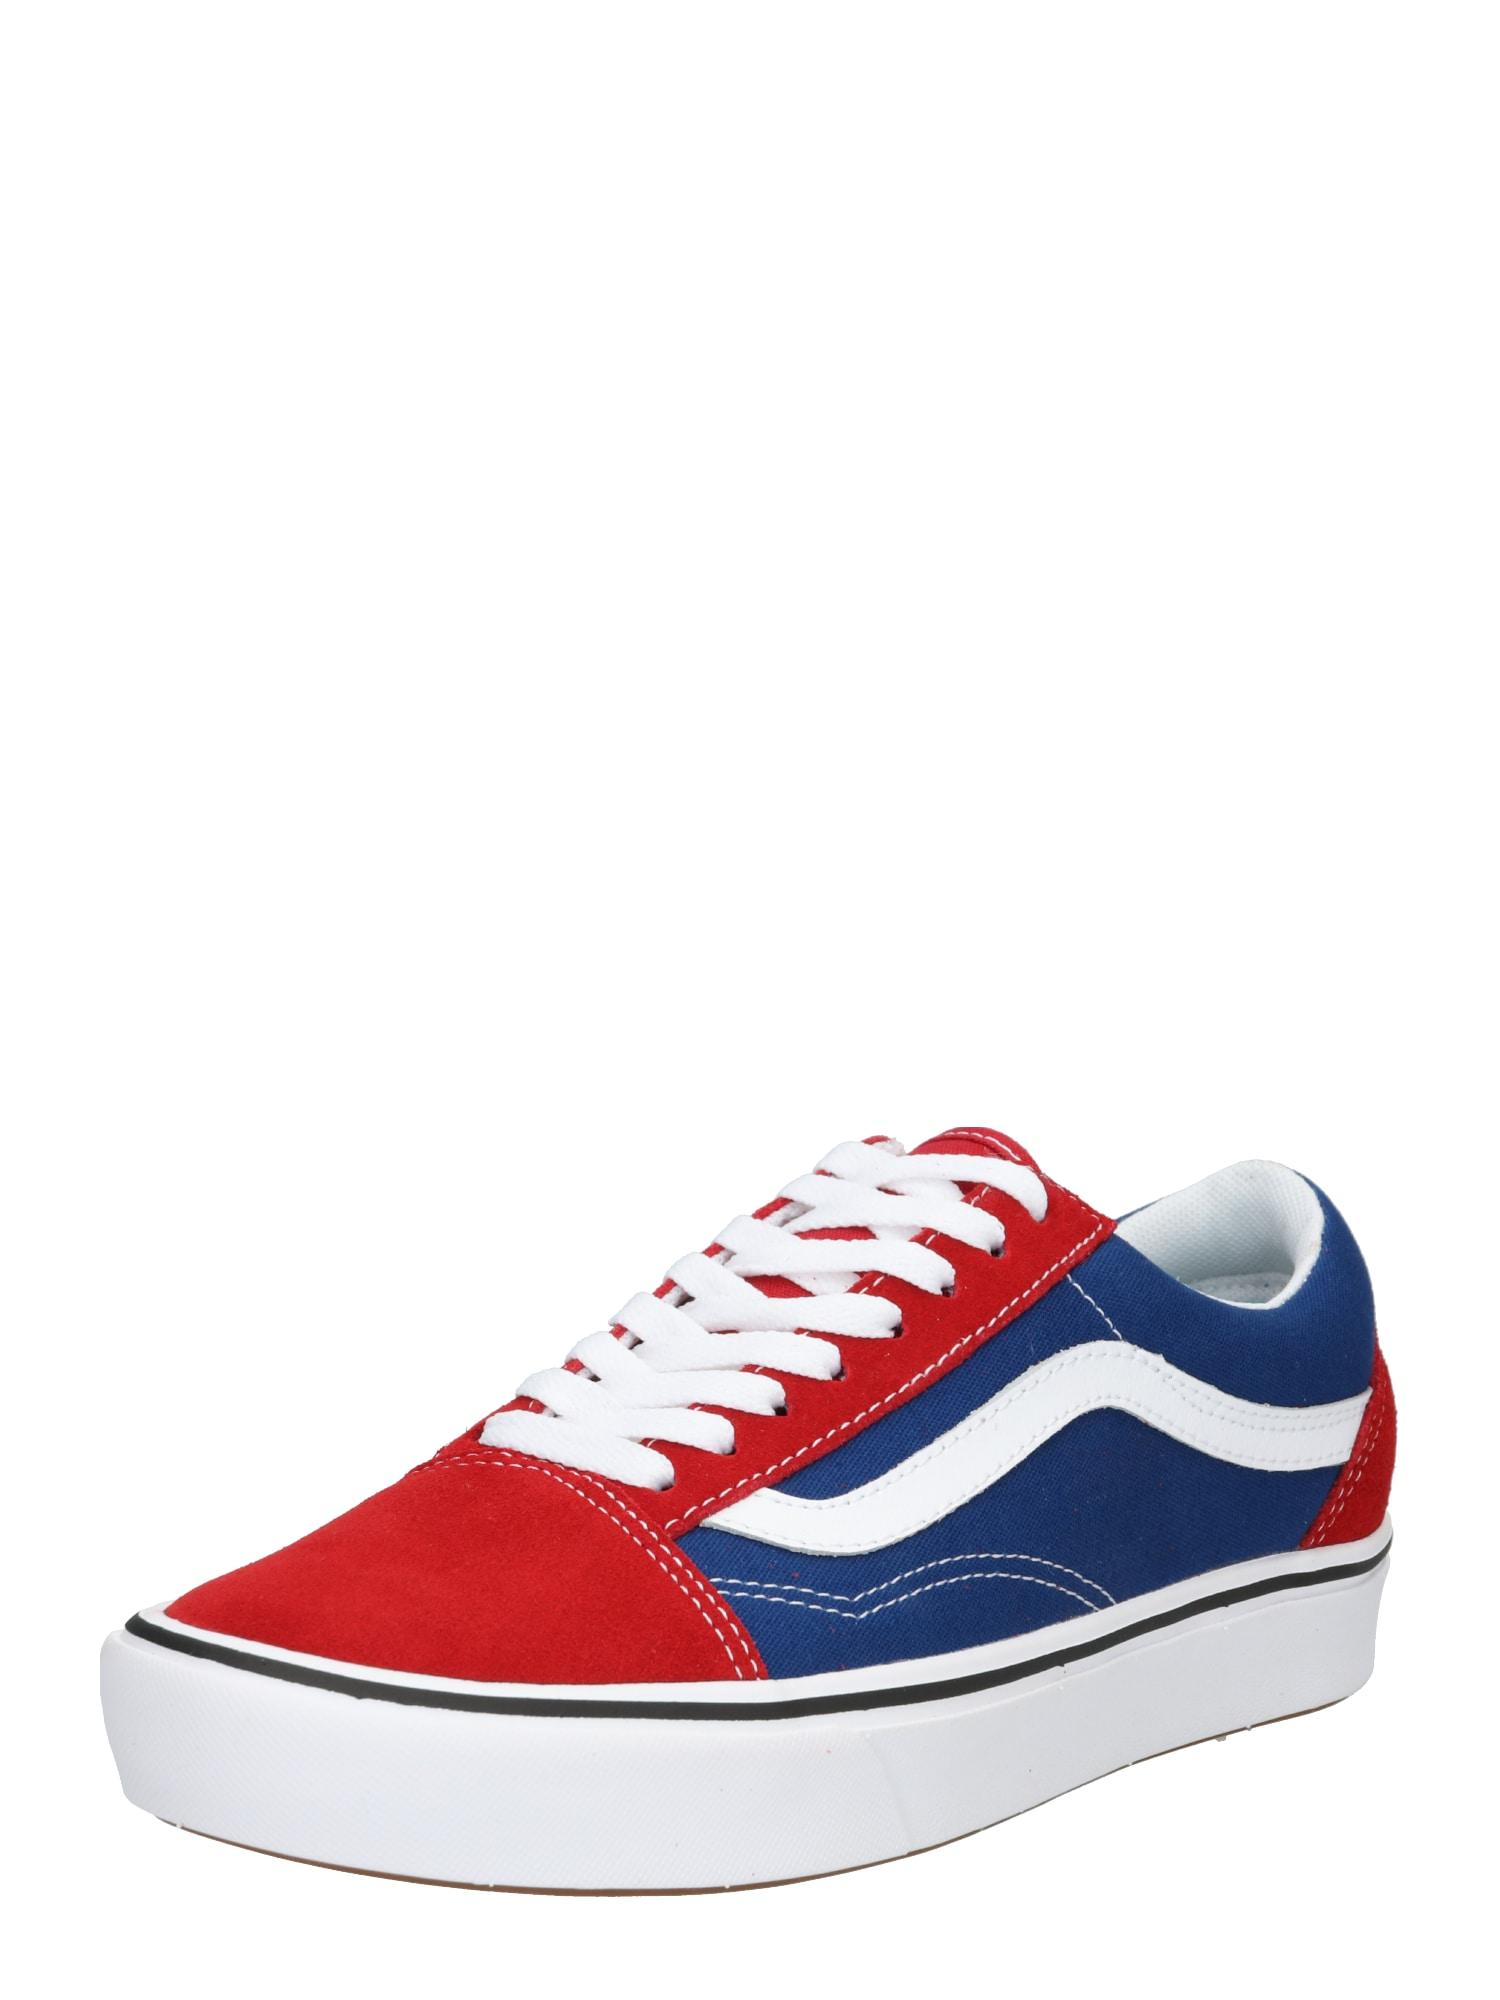 Tenisky modrá červená VANS